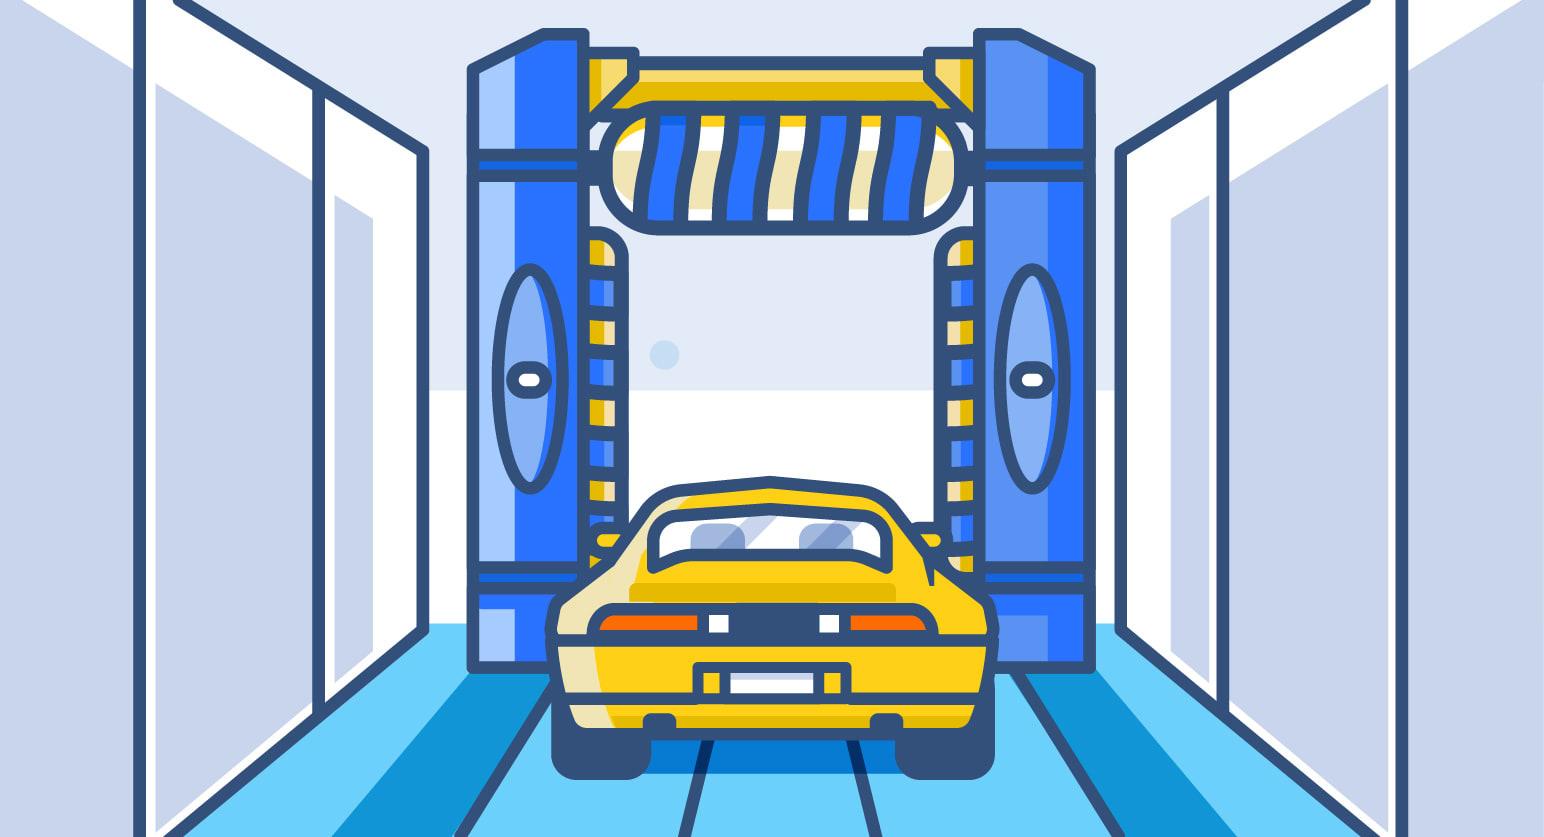 Automatic/Drive-Through Car Wash